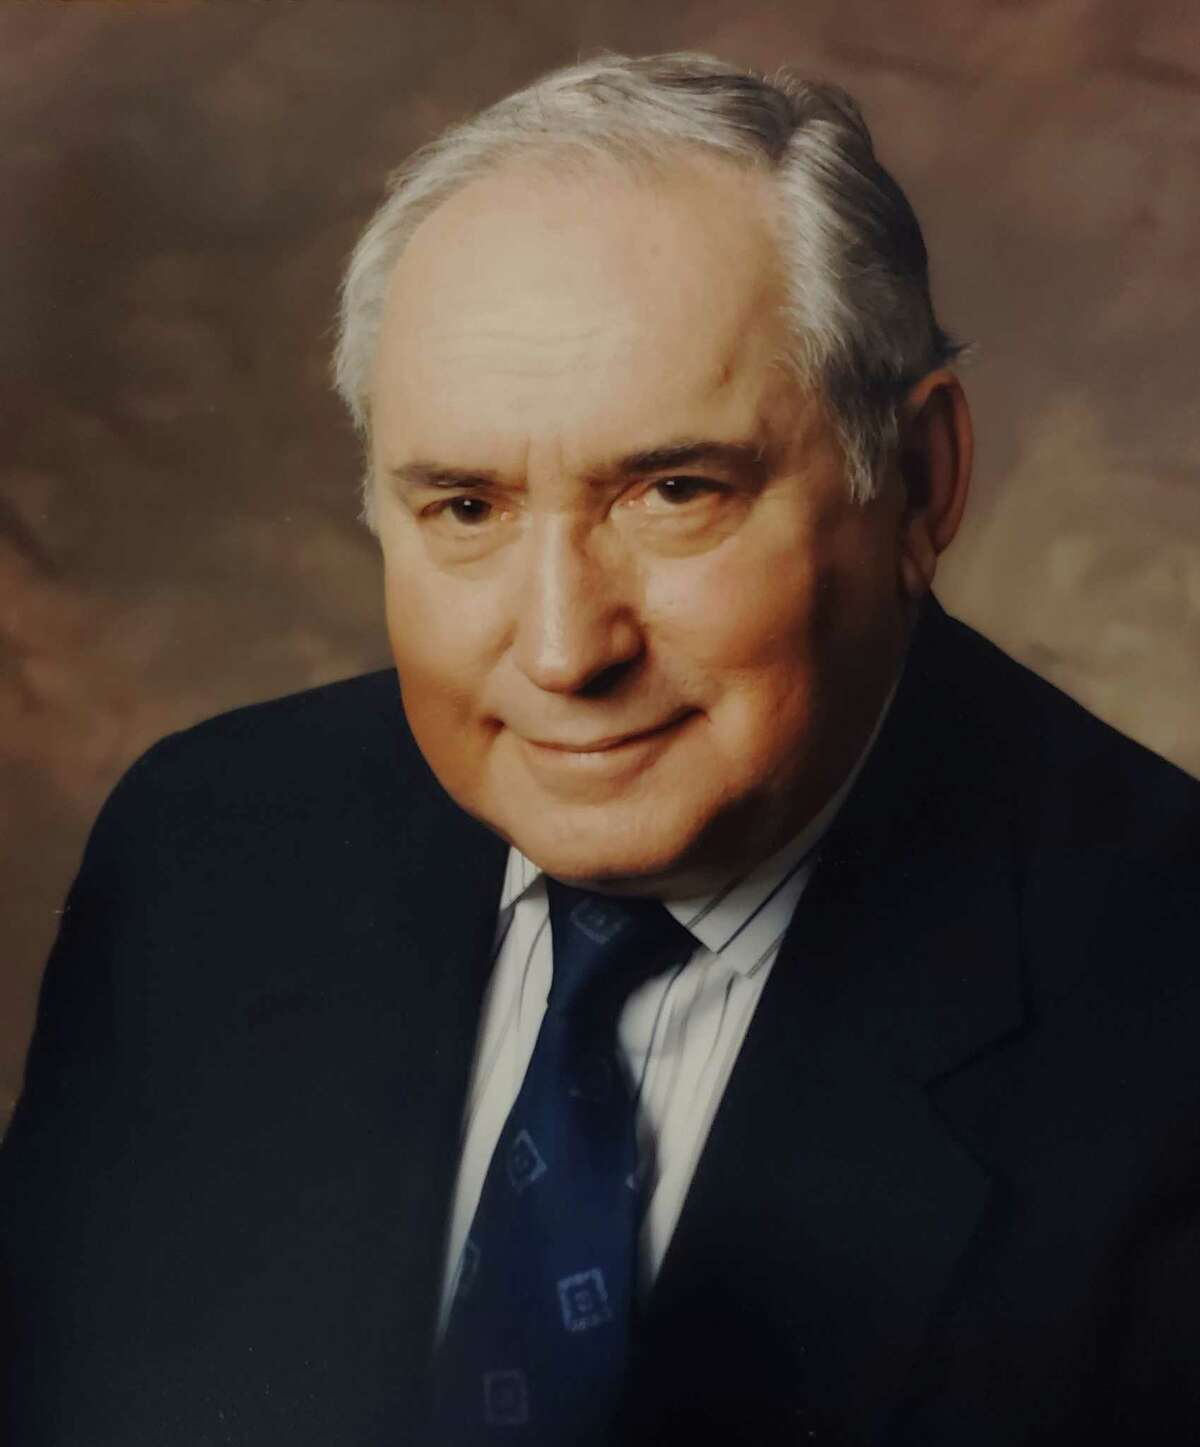 Ernie Tetrault